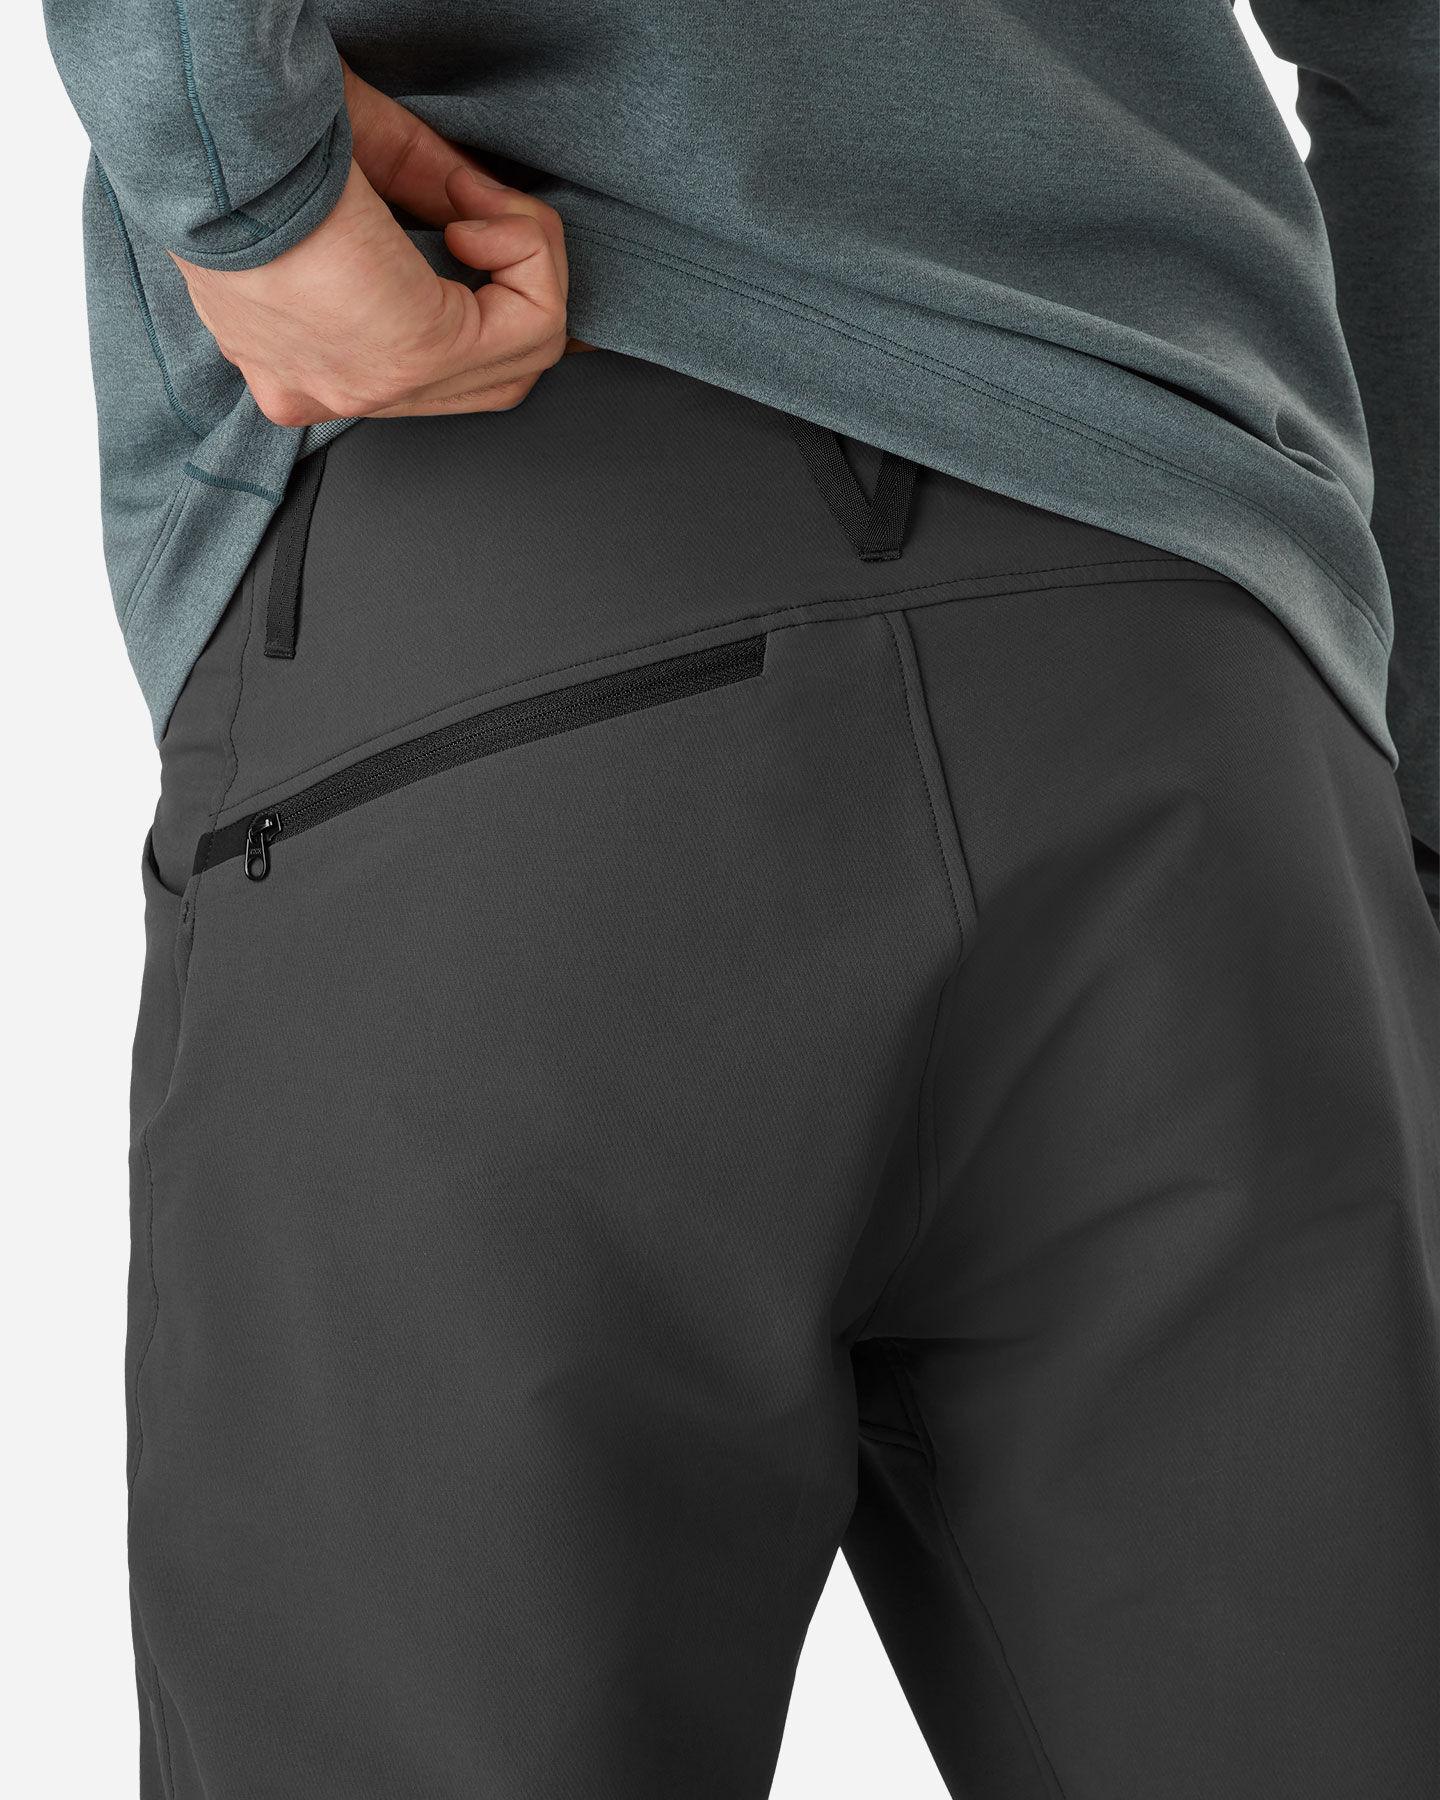 Pantalone outdoor ARC'TERYX CRESTON M S4083259 scatto 5